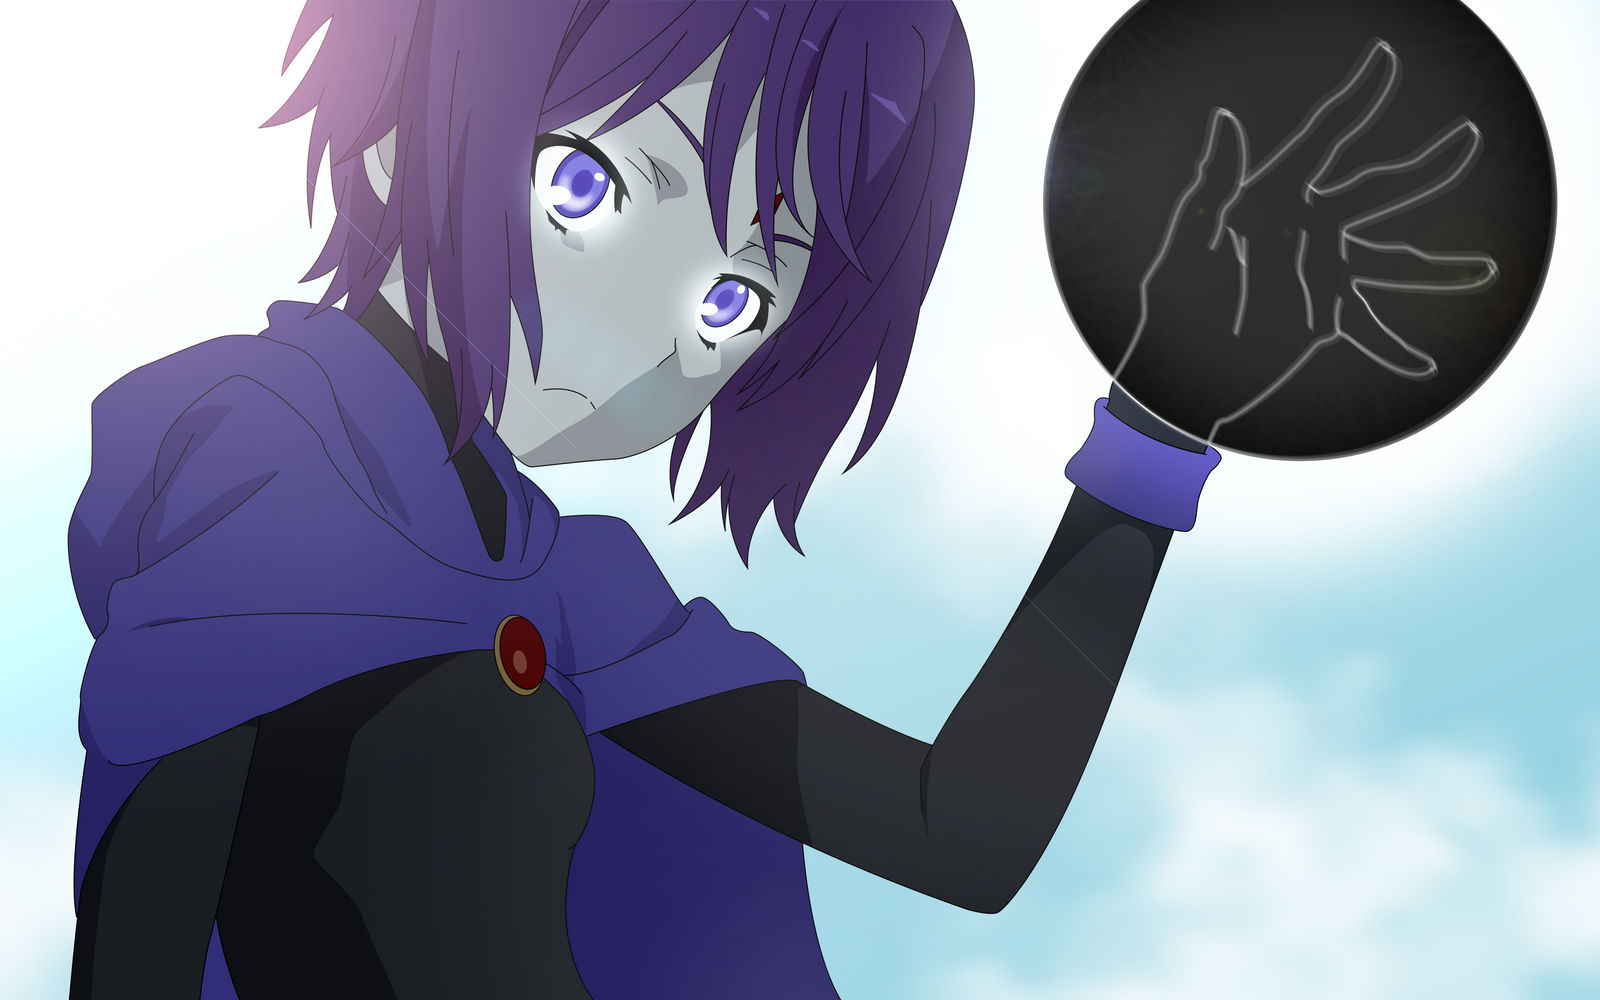 young raven anime  teen titans  wallpaper  by sgcassidy d73uftq